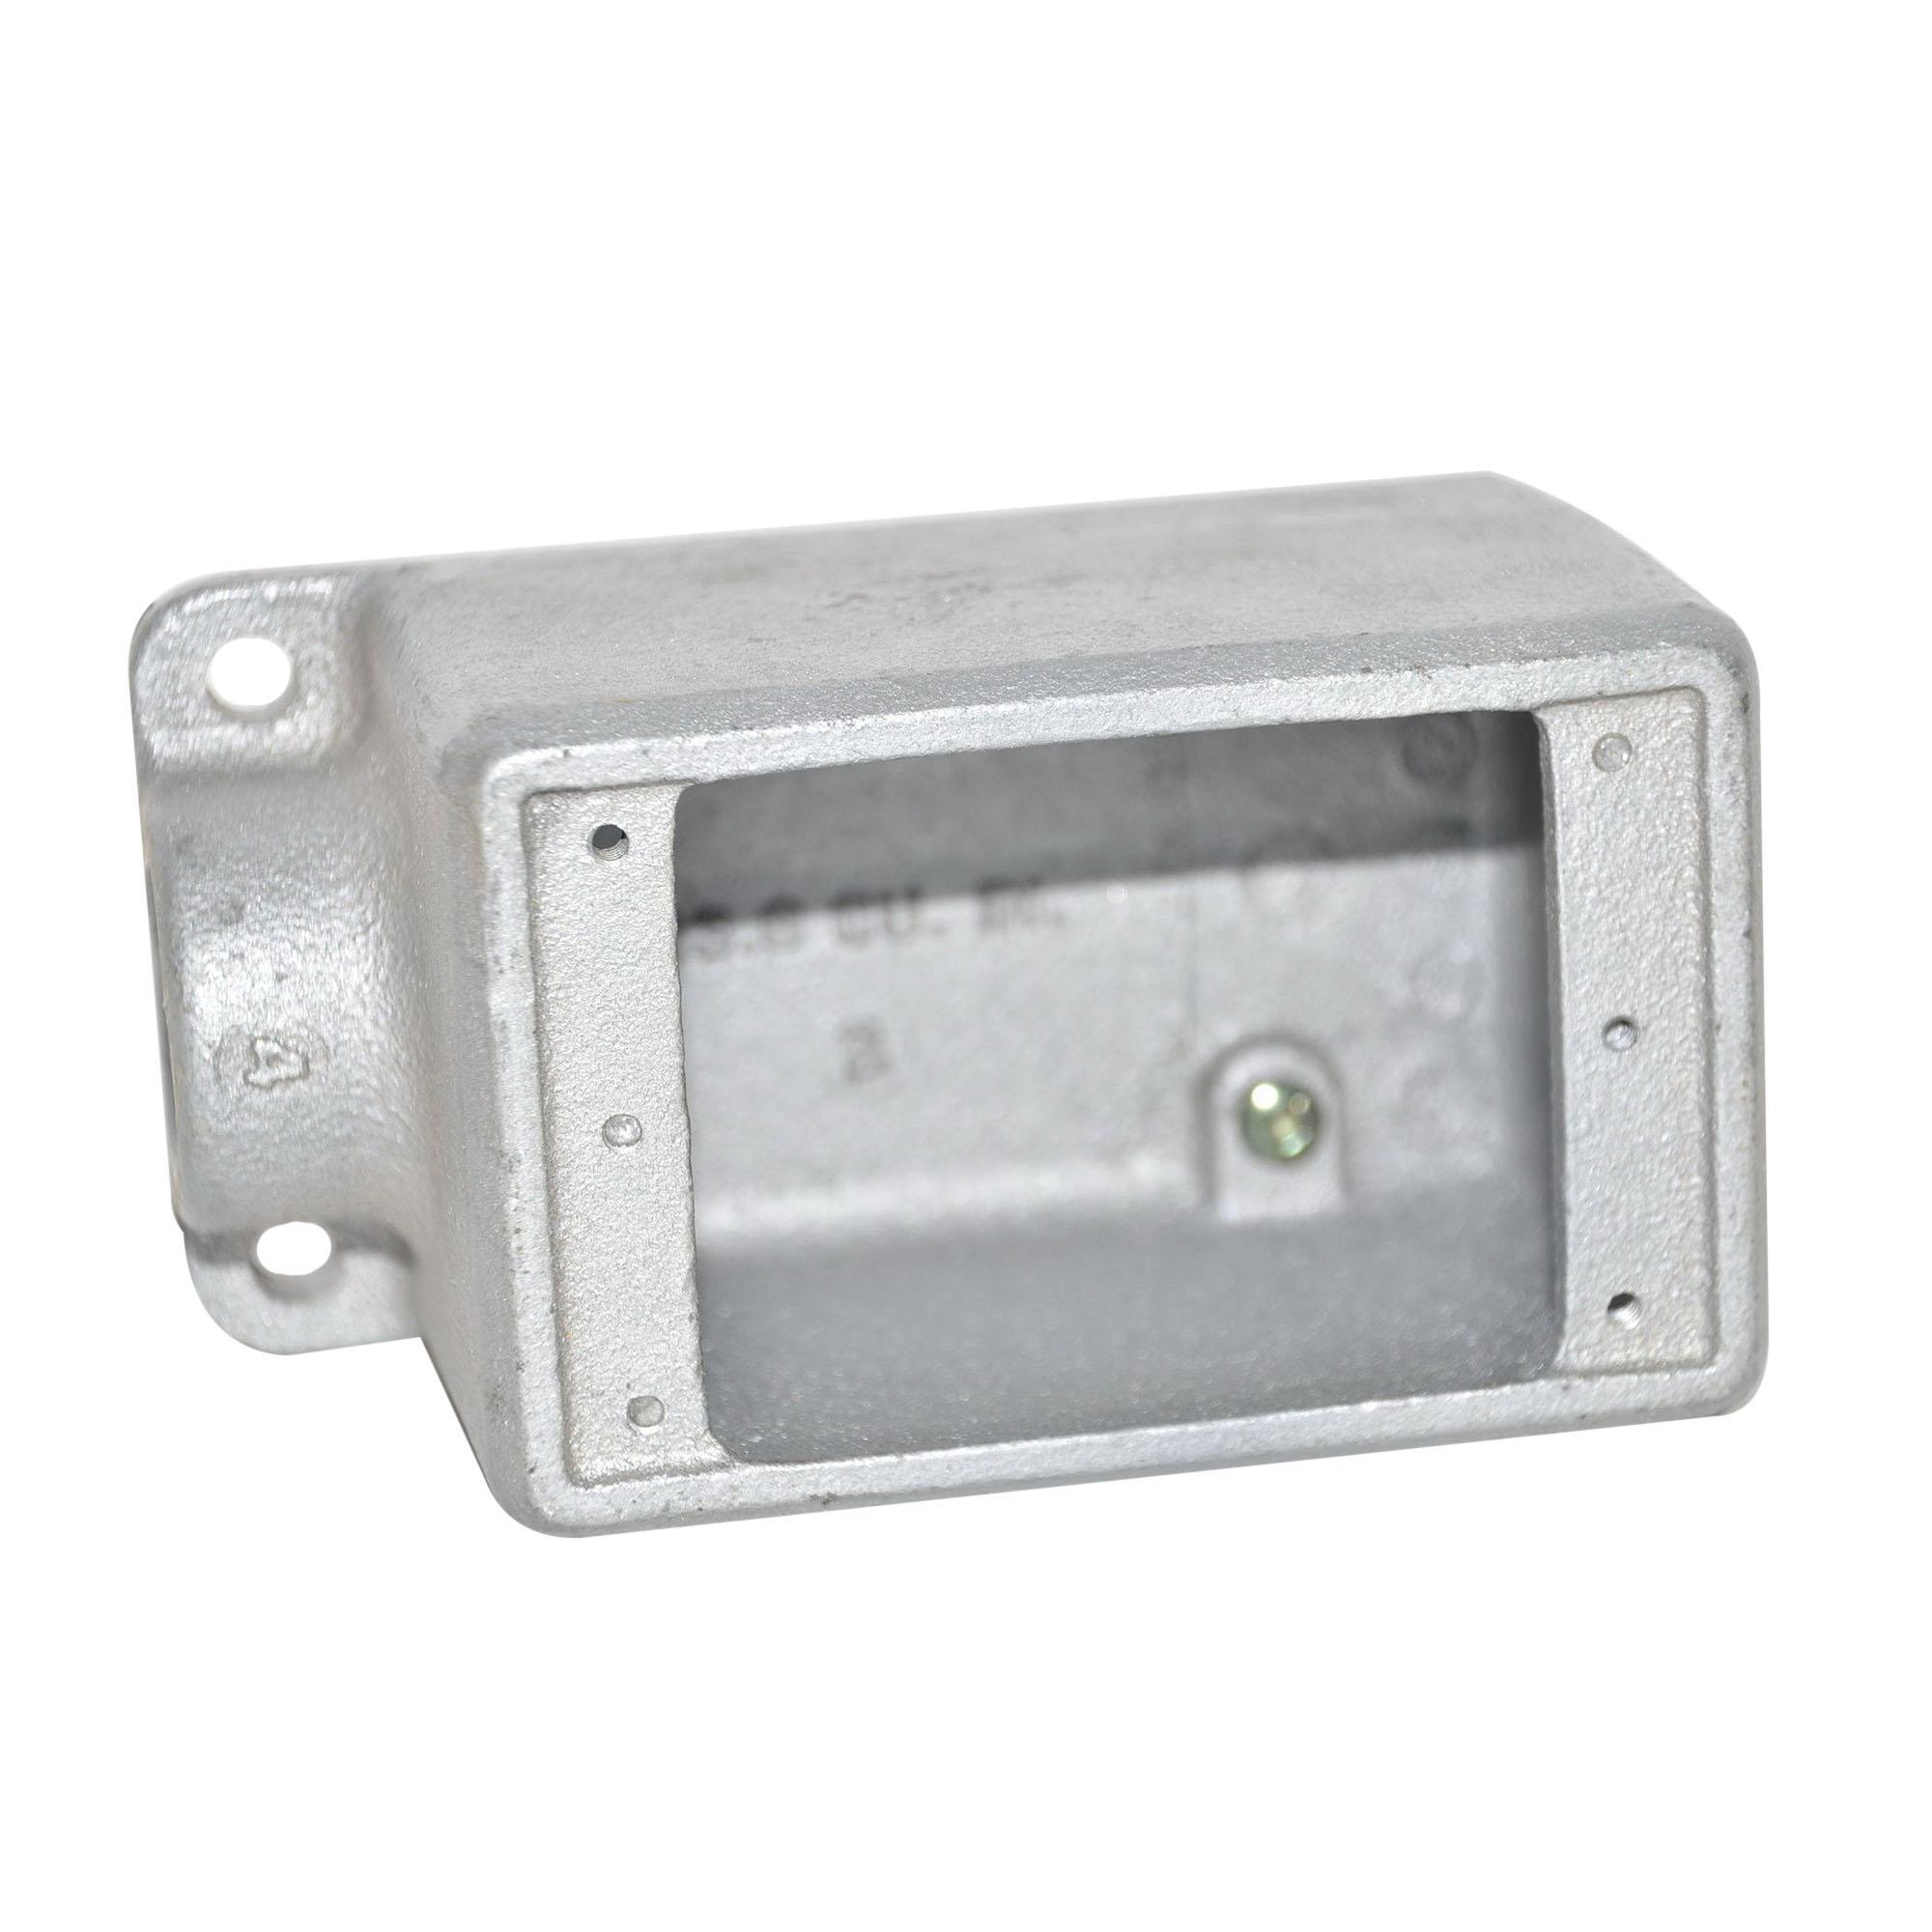 Crouse Hinds Fs2 Electrogalvanized Feraloy 174 Iron Alloy 1